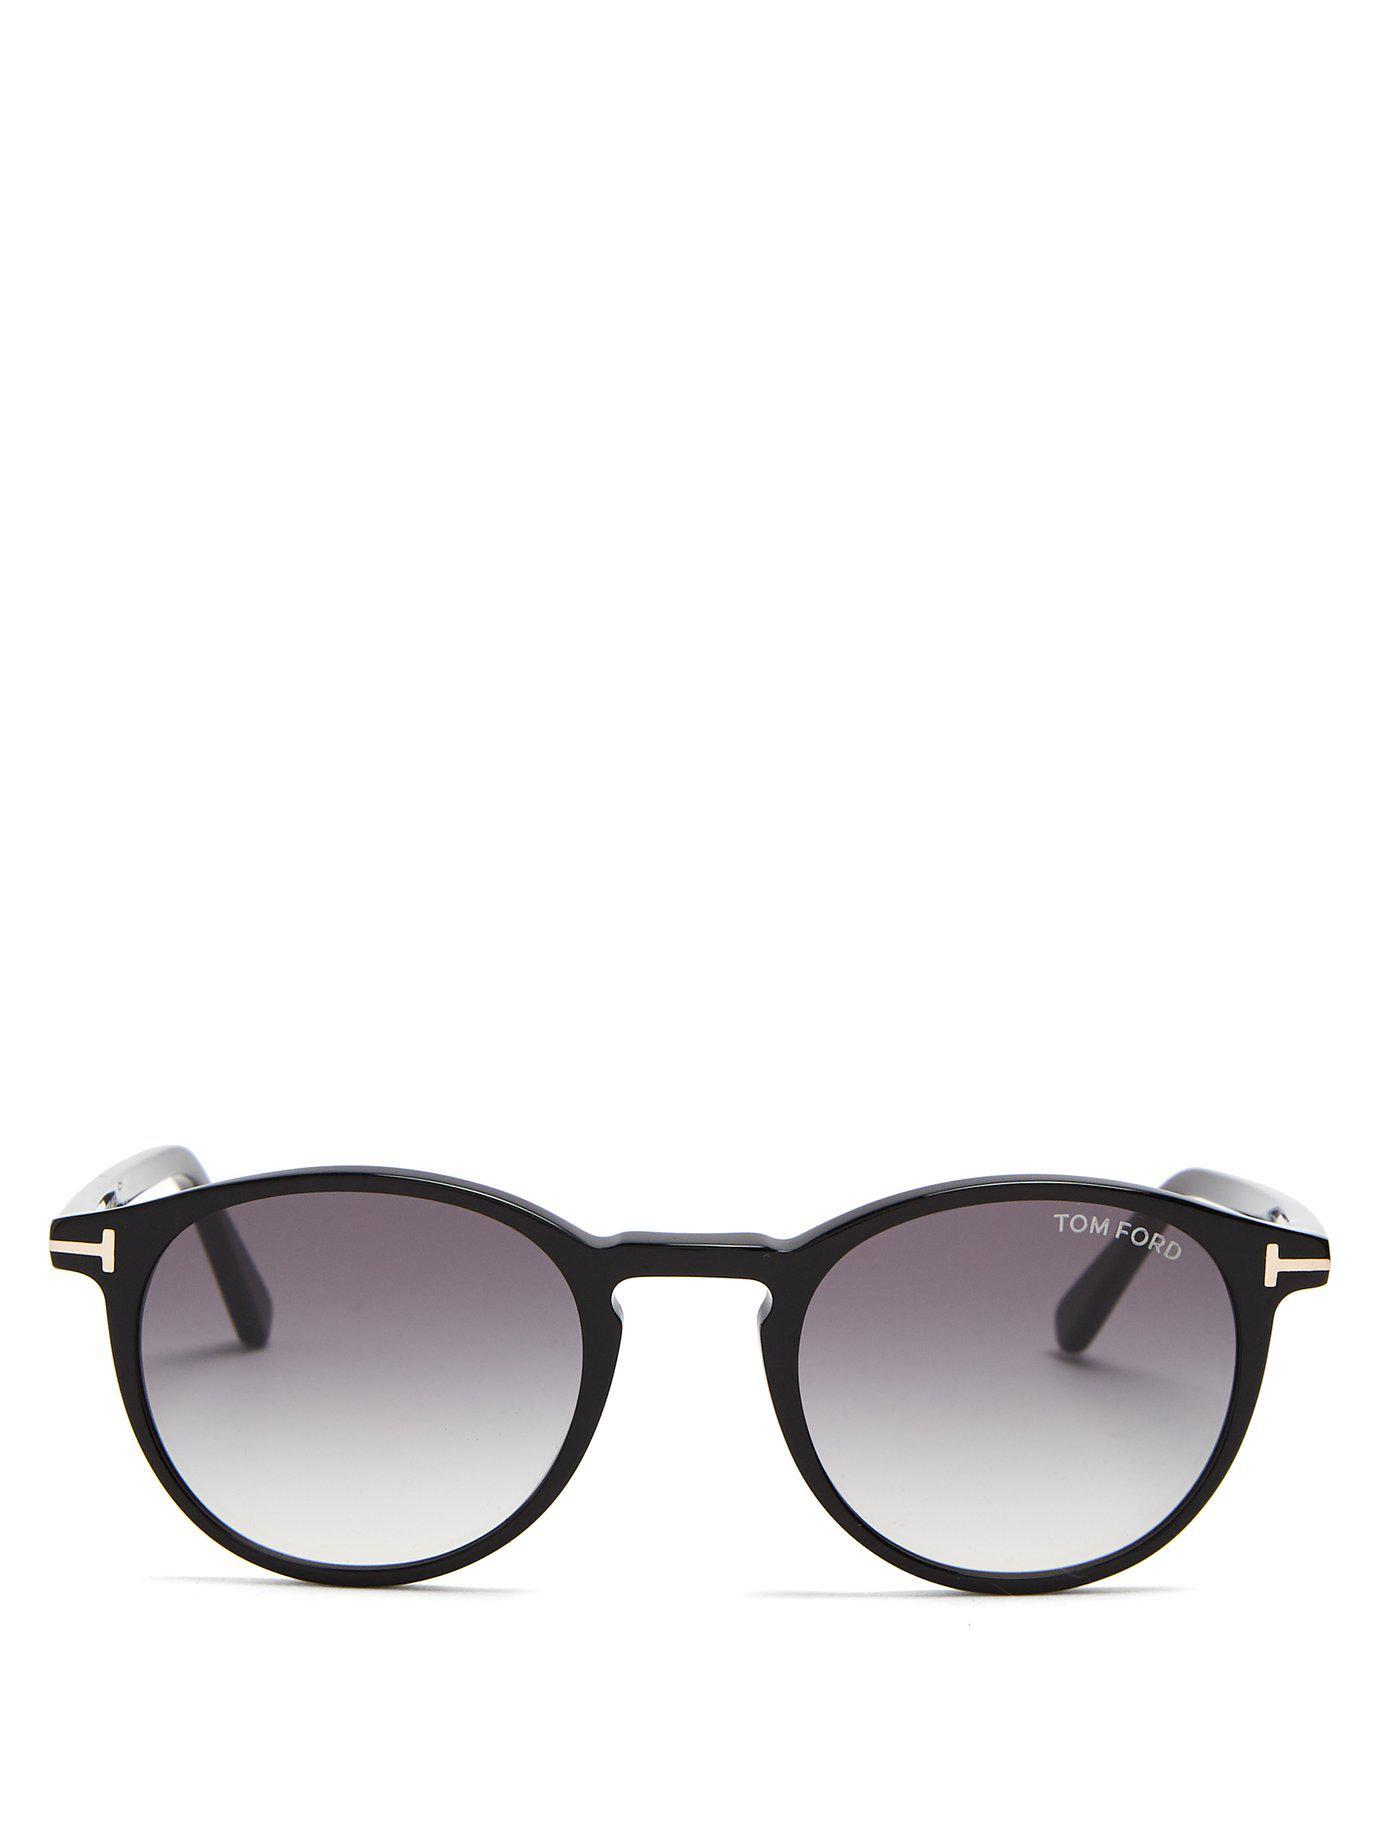 6aeb70472e3d6 Tom Ford Eric Round Frame Sunglasses in Black for Men - Lyst